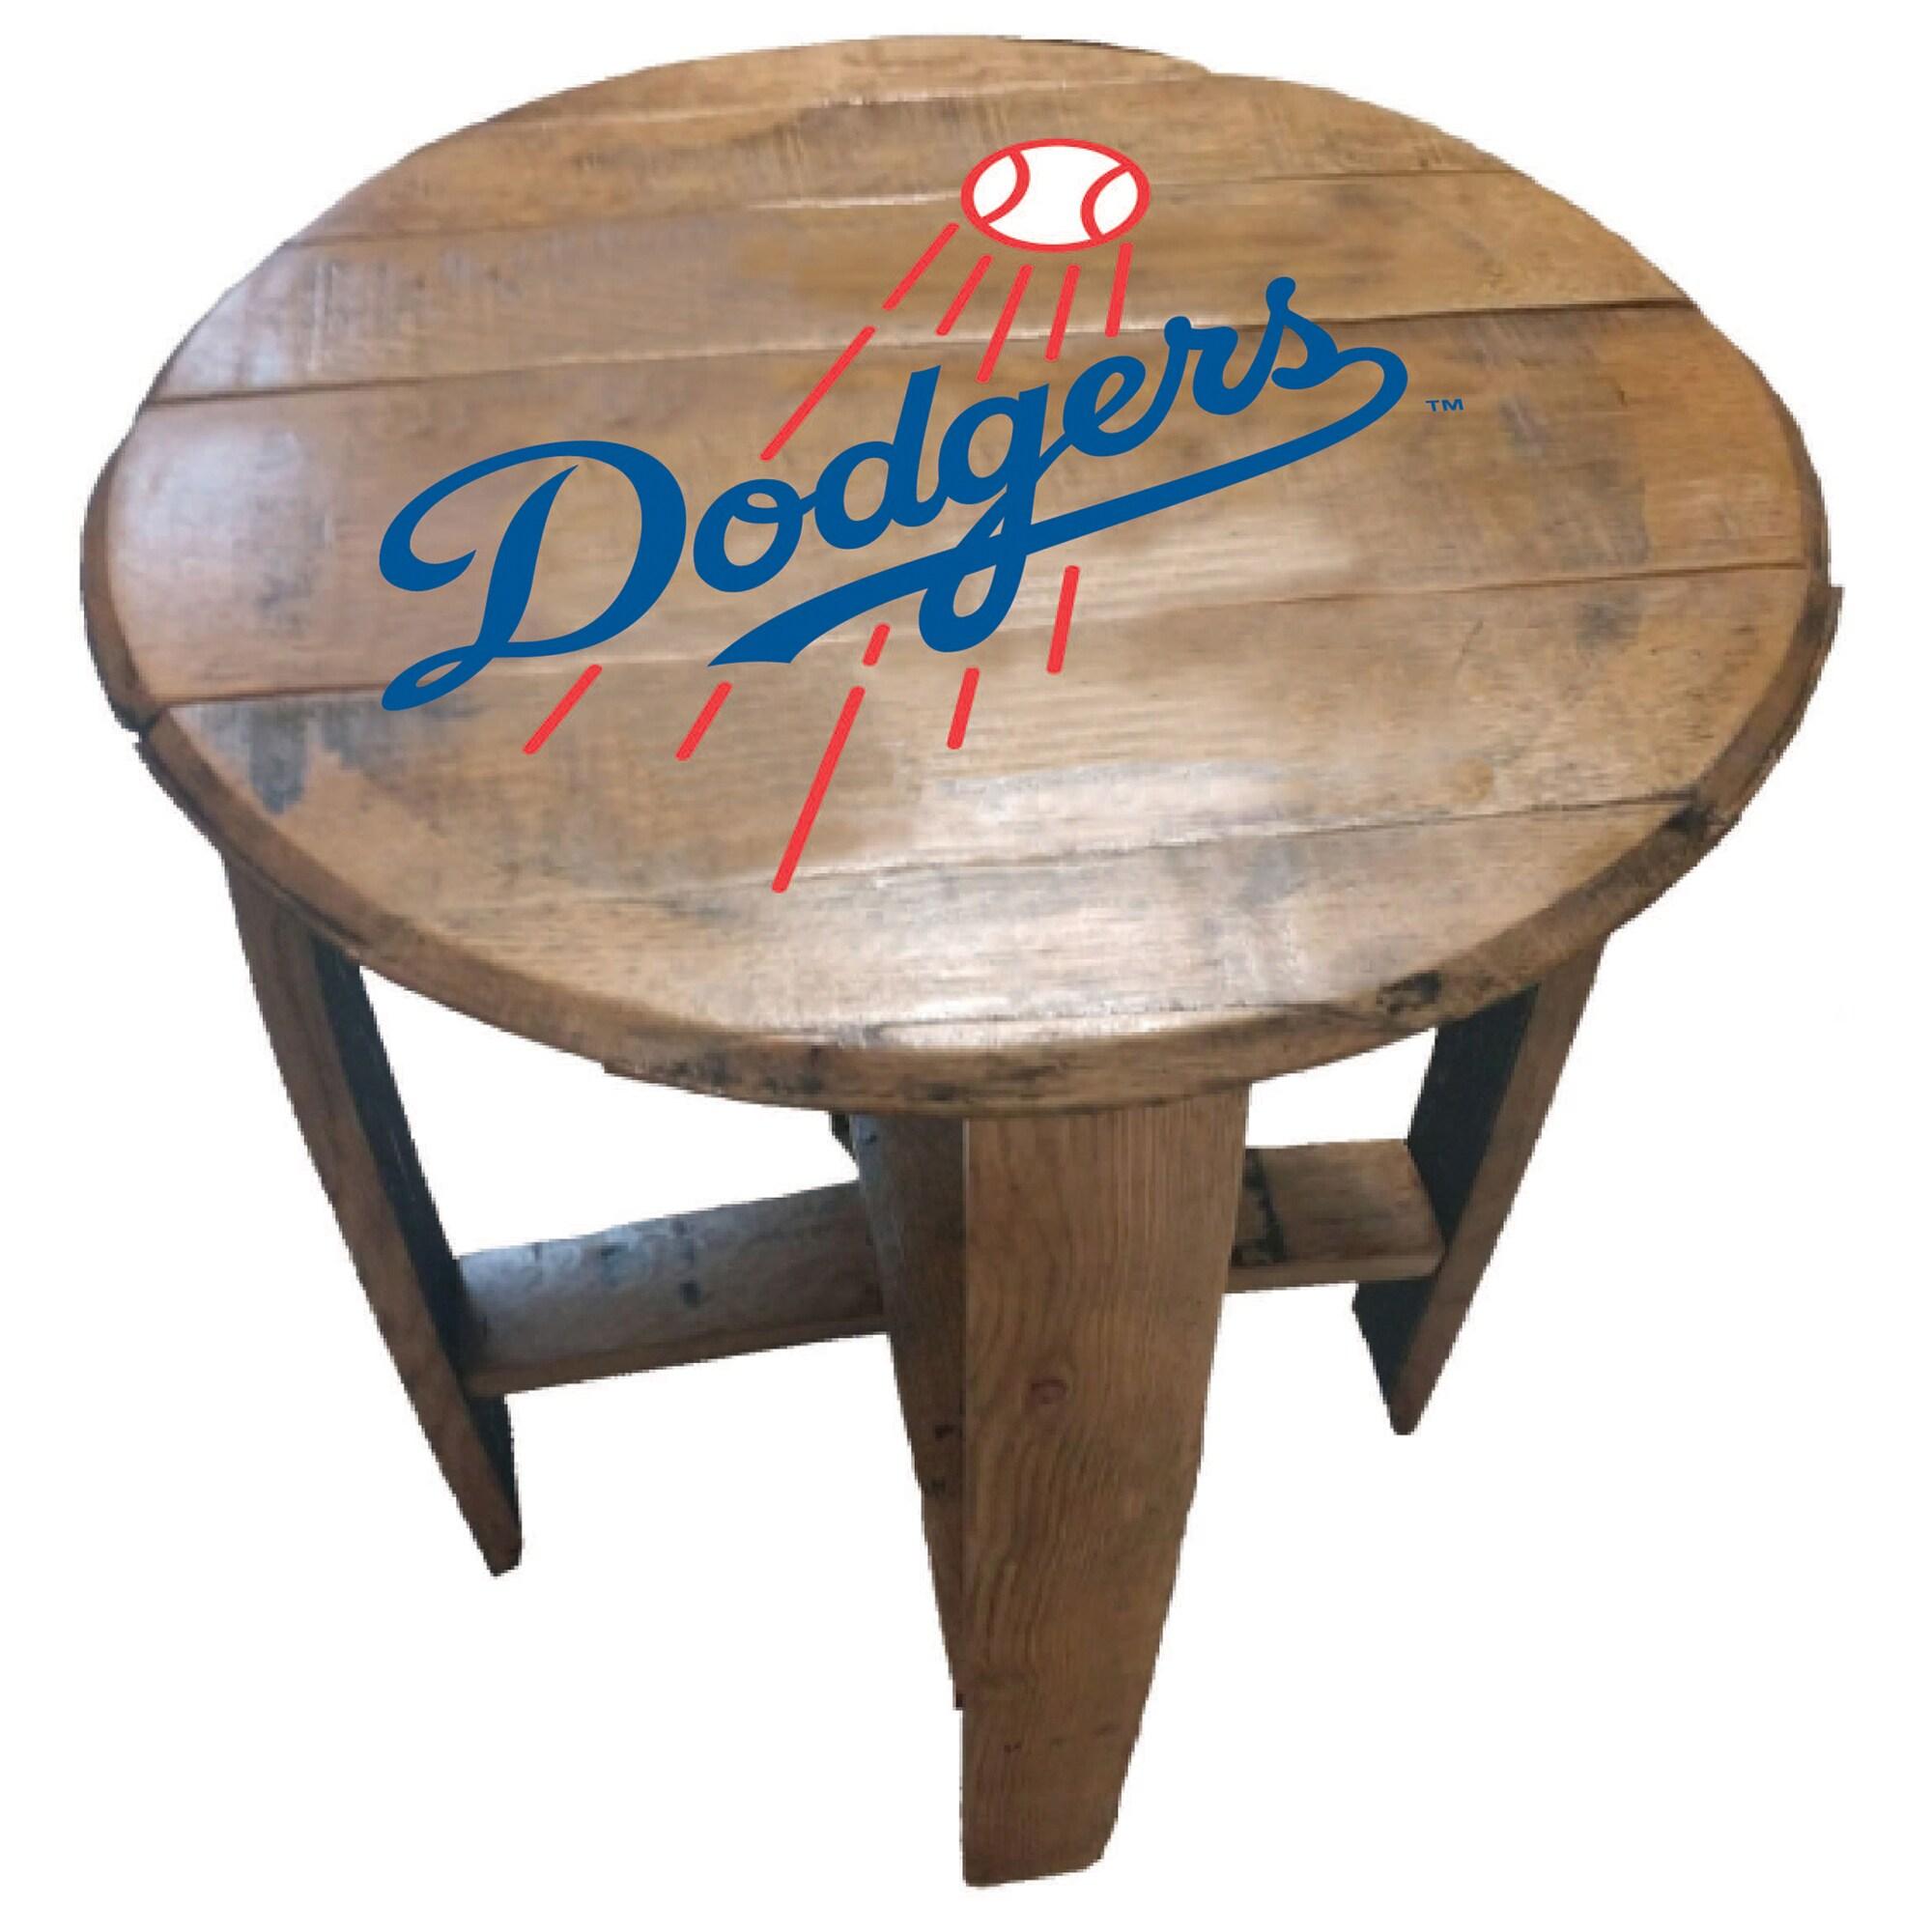 Los Angeles Dodgers Imperial Oak Barrel Table